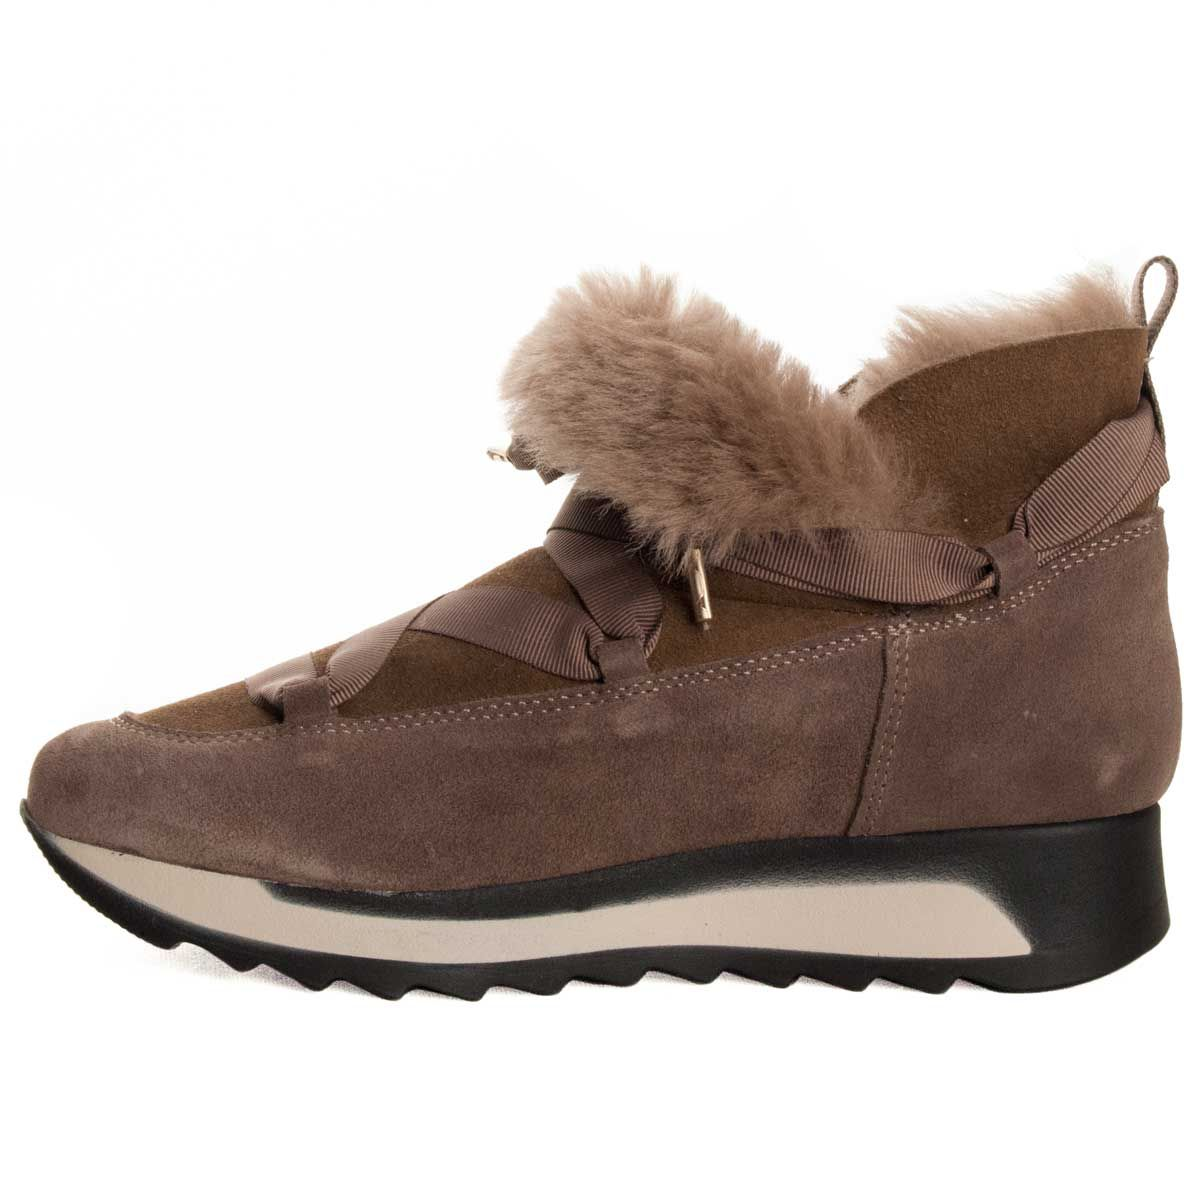 Montevita Fur Lined Sneaker Boot in Beige